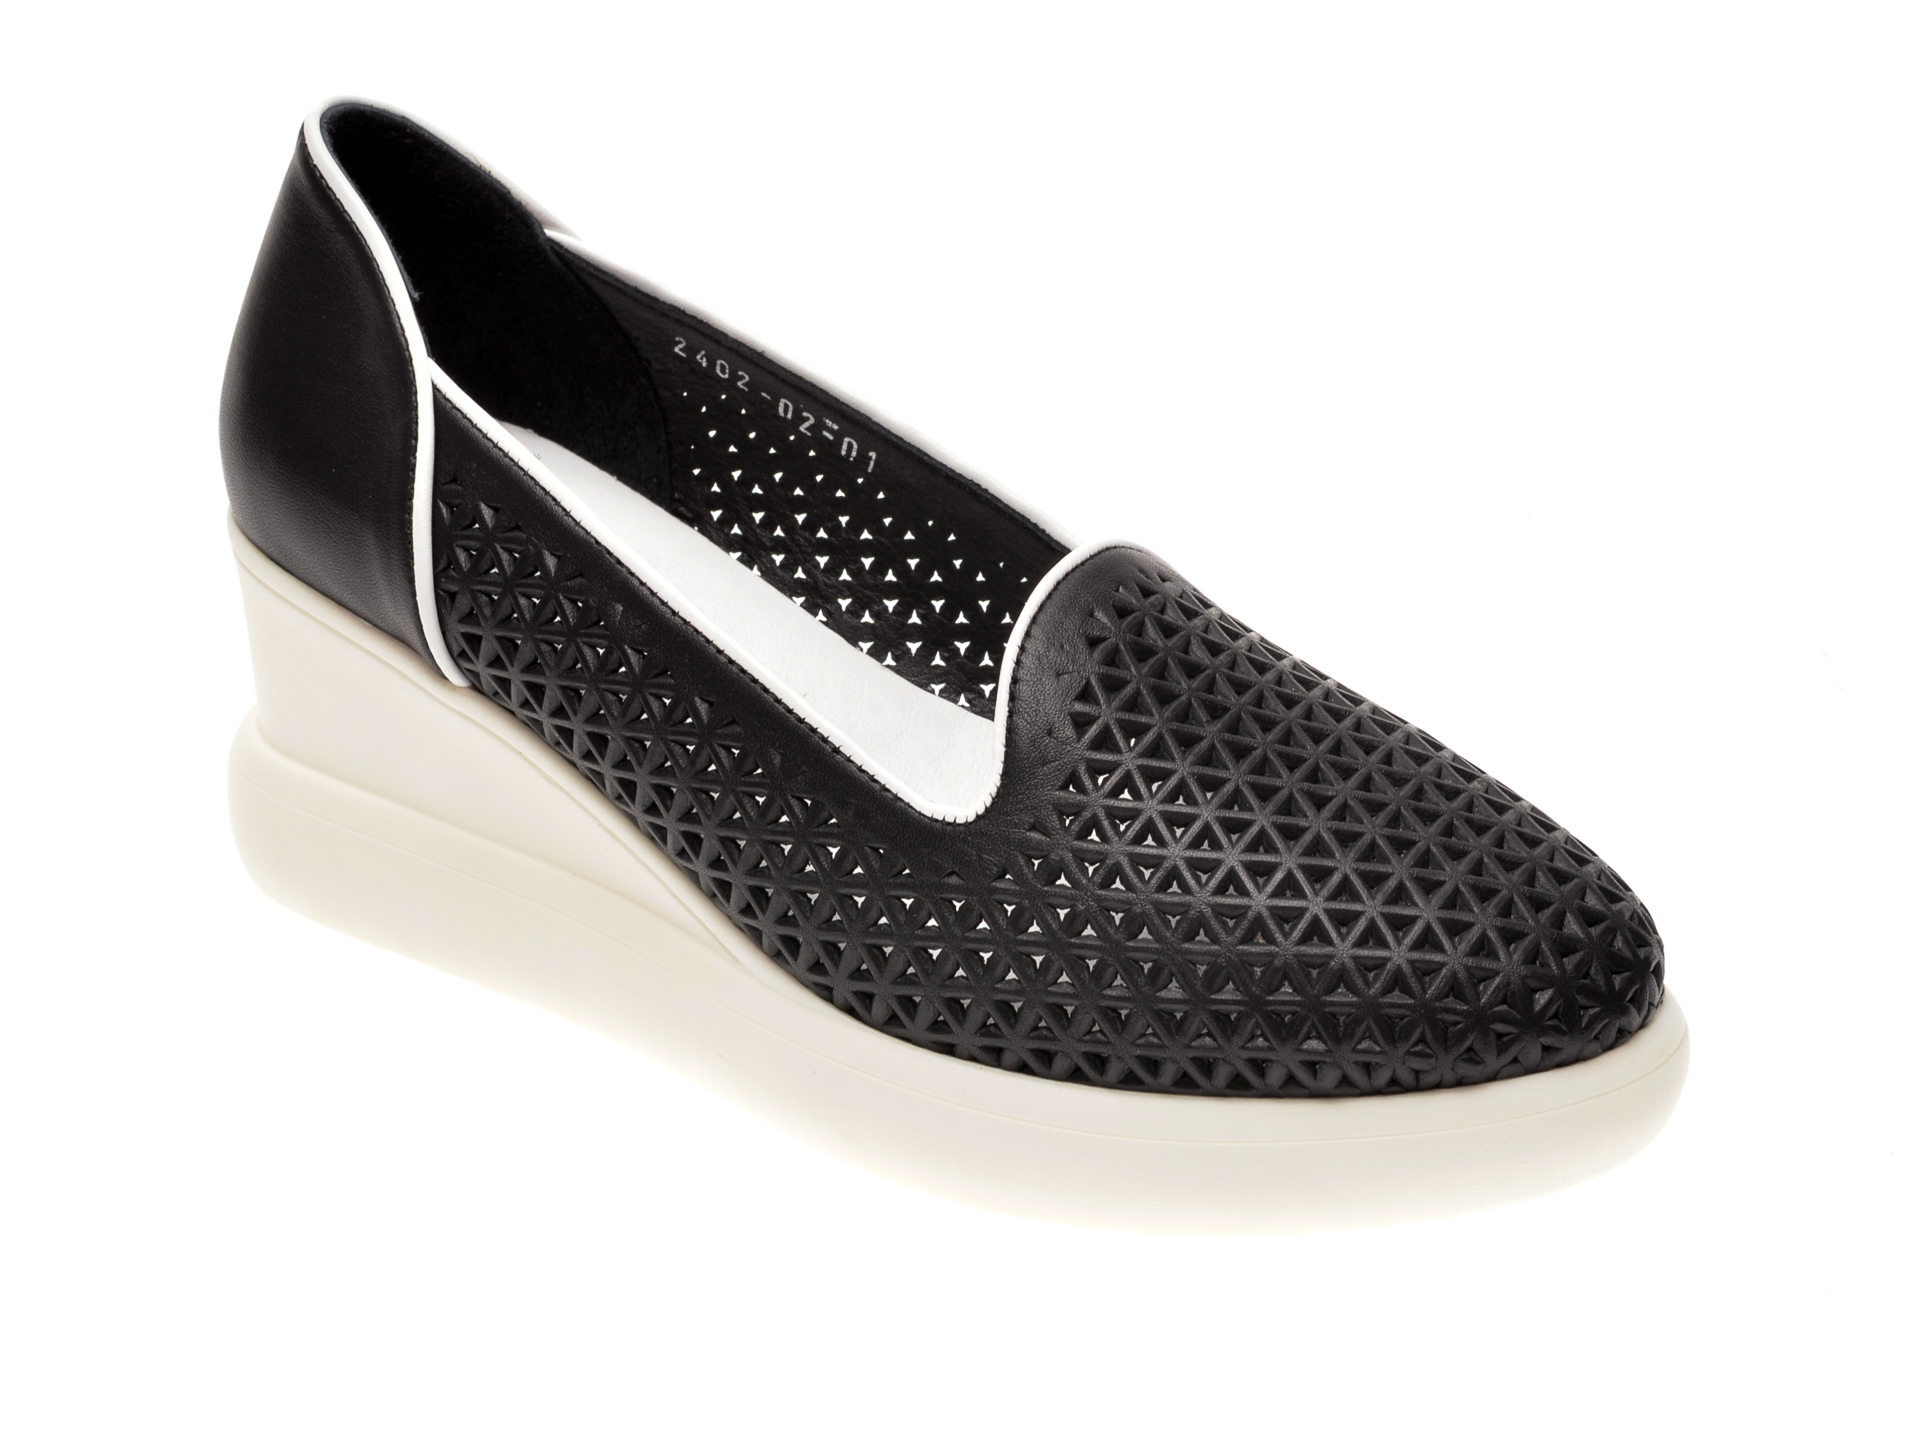 Pantofi MISS LIZA negri, 1182402, din piele naturala